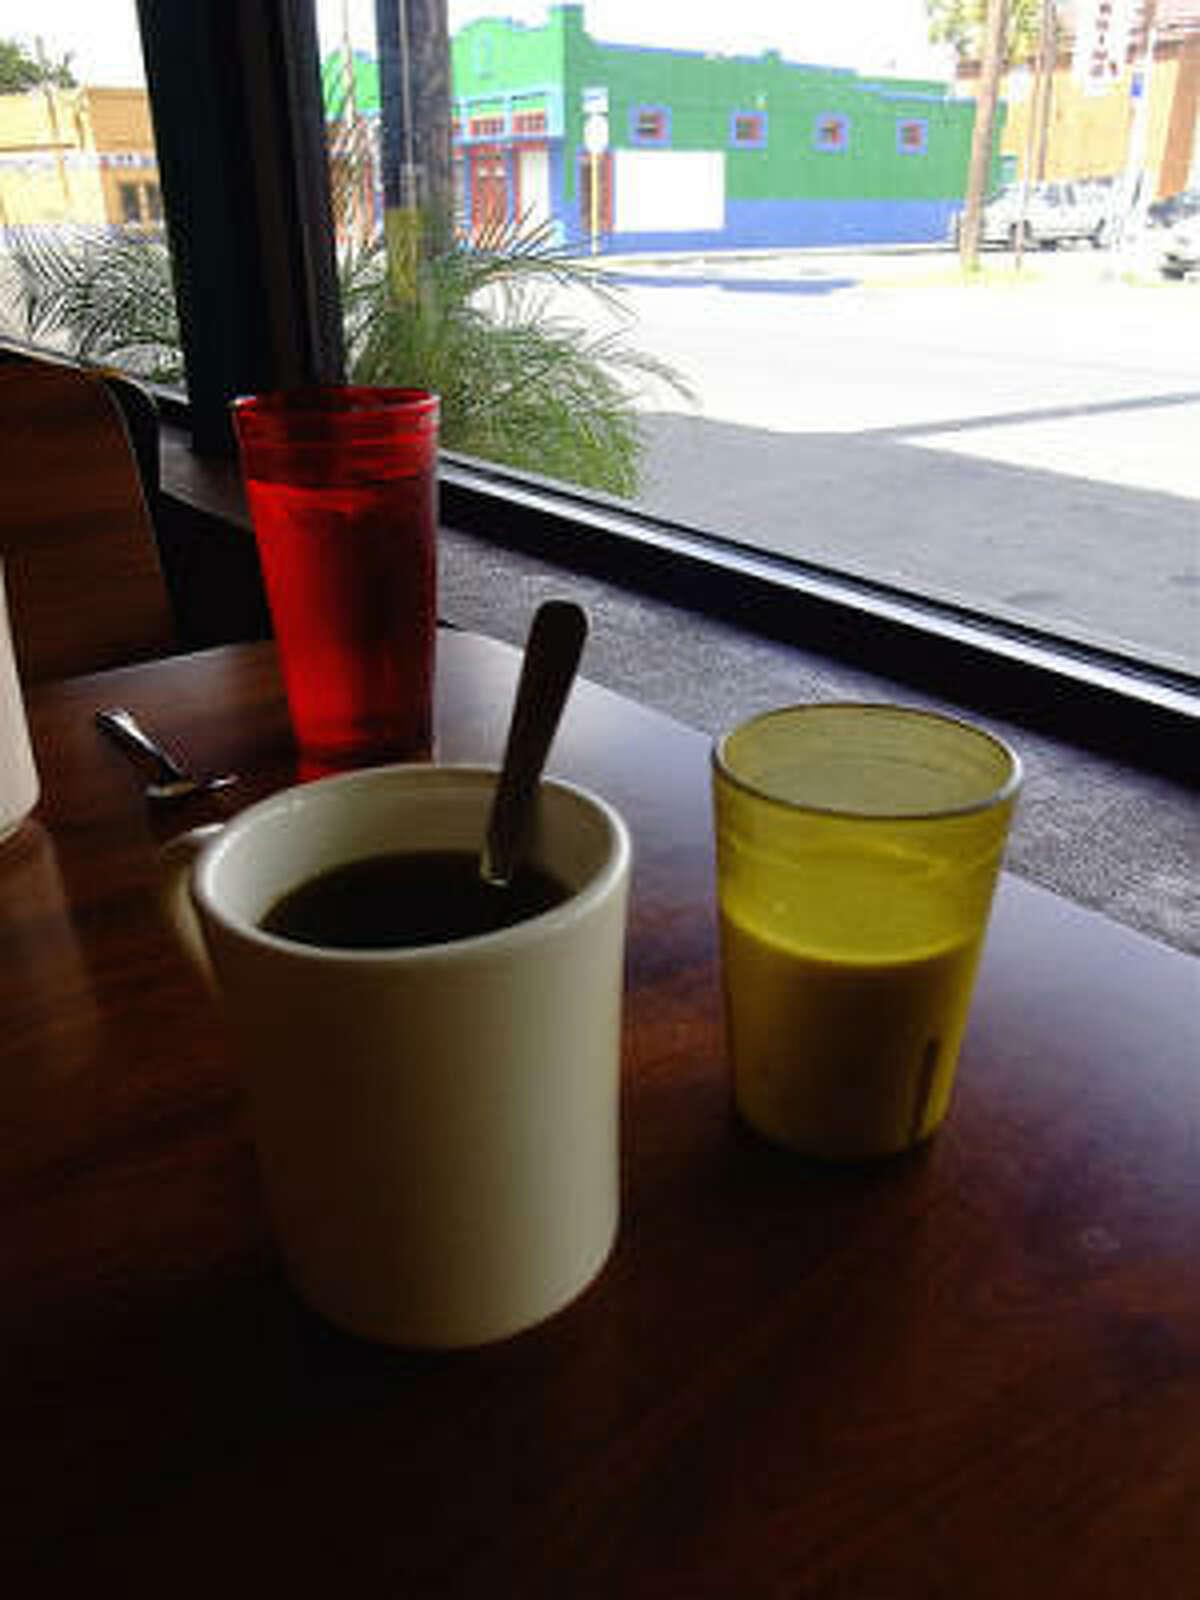 Coffee service at Taco Haven in San Antonio. Note milk delivered in